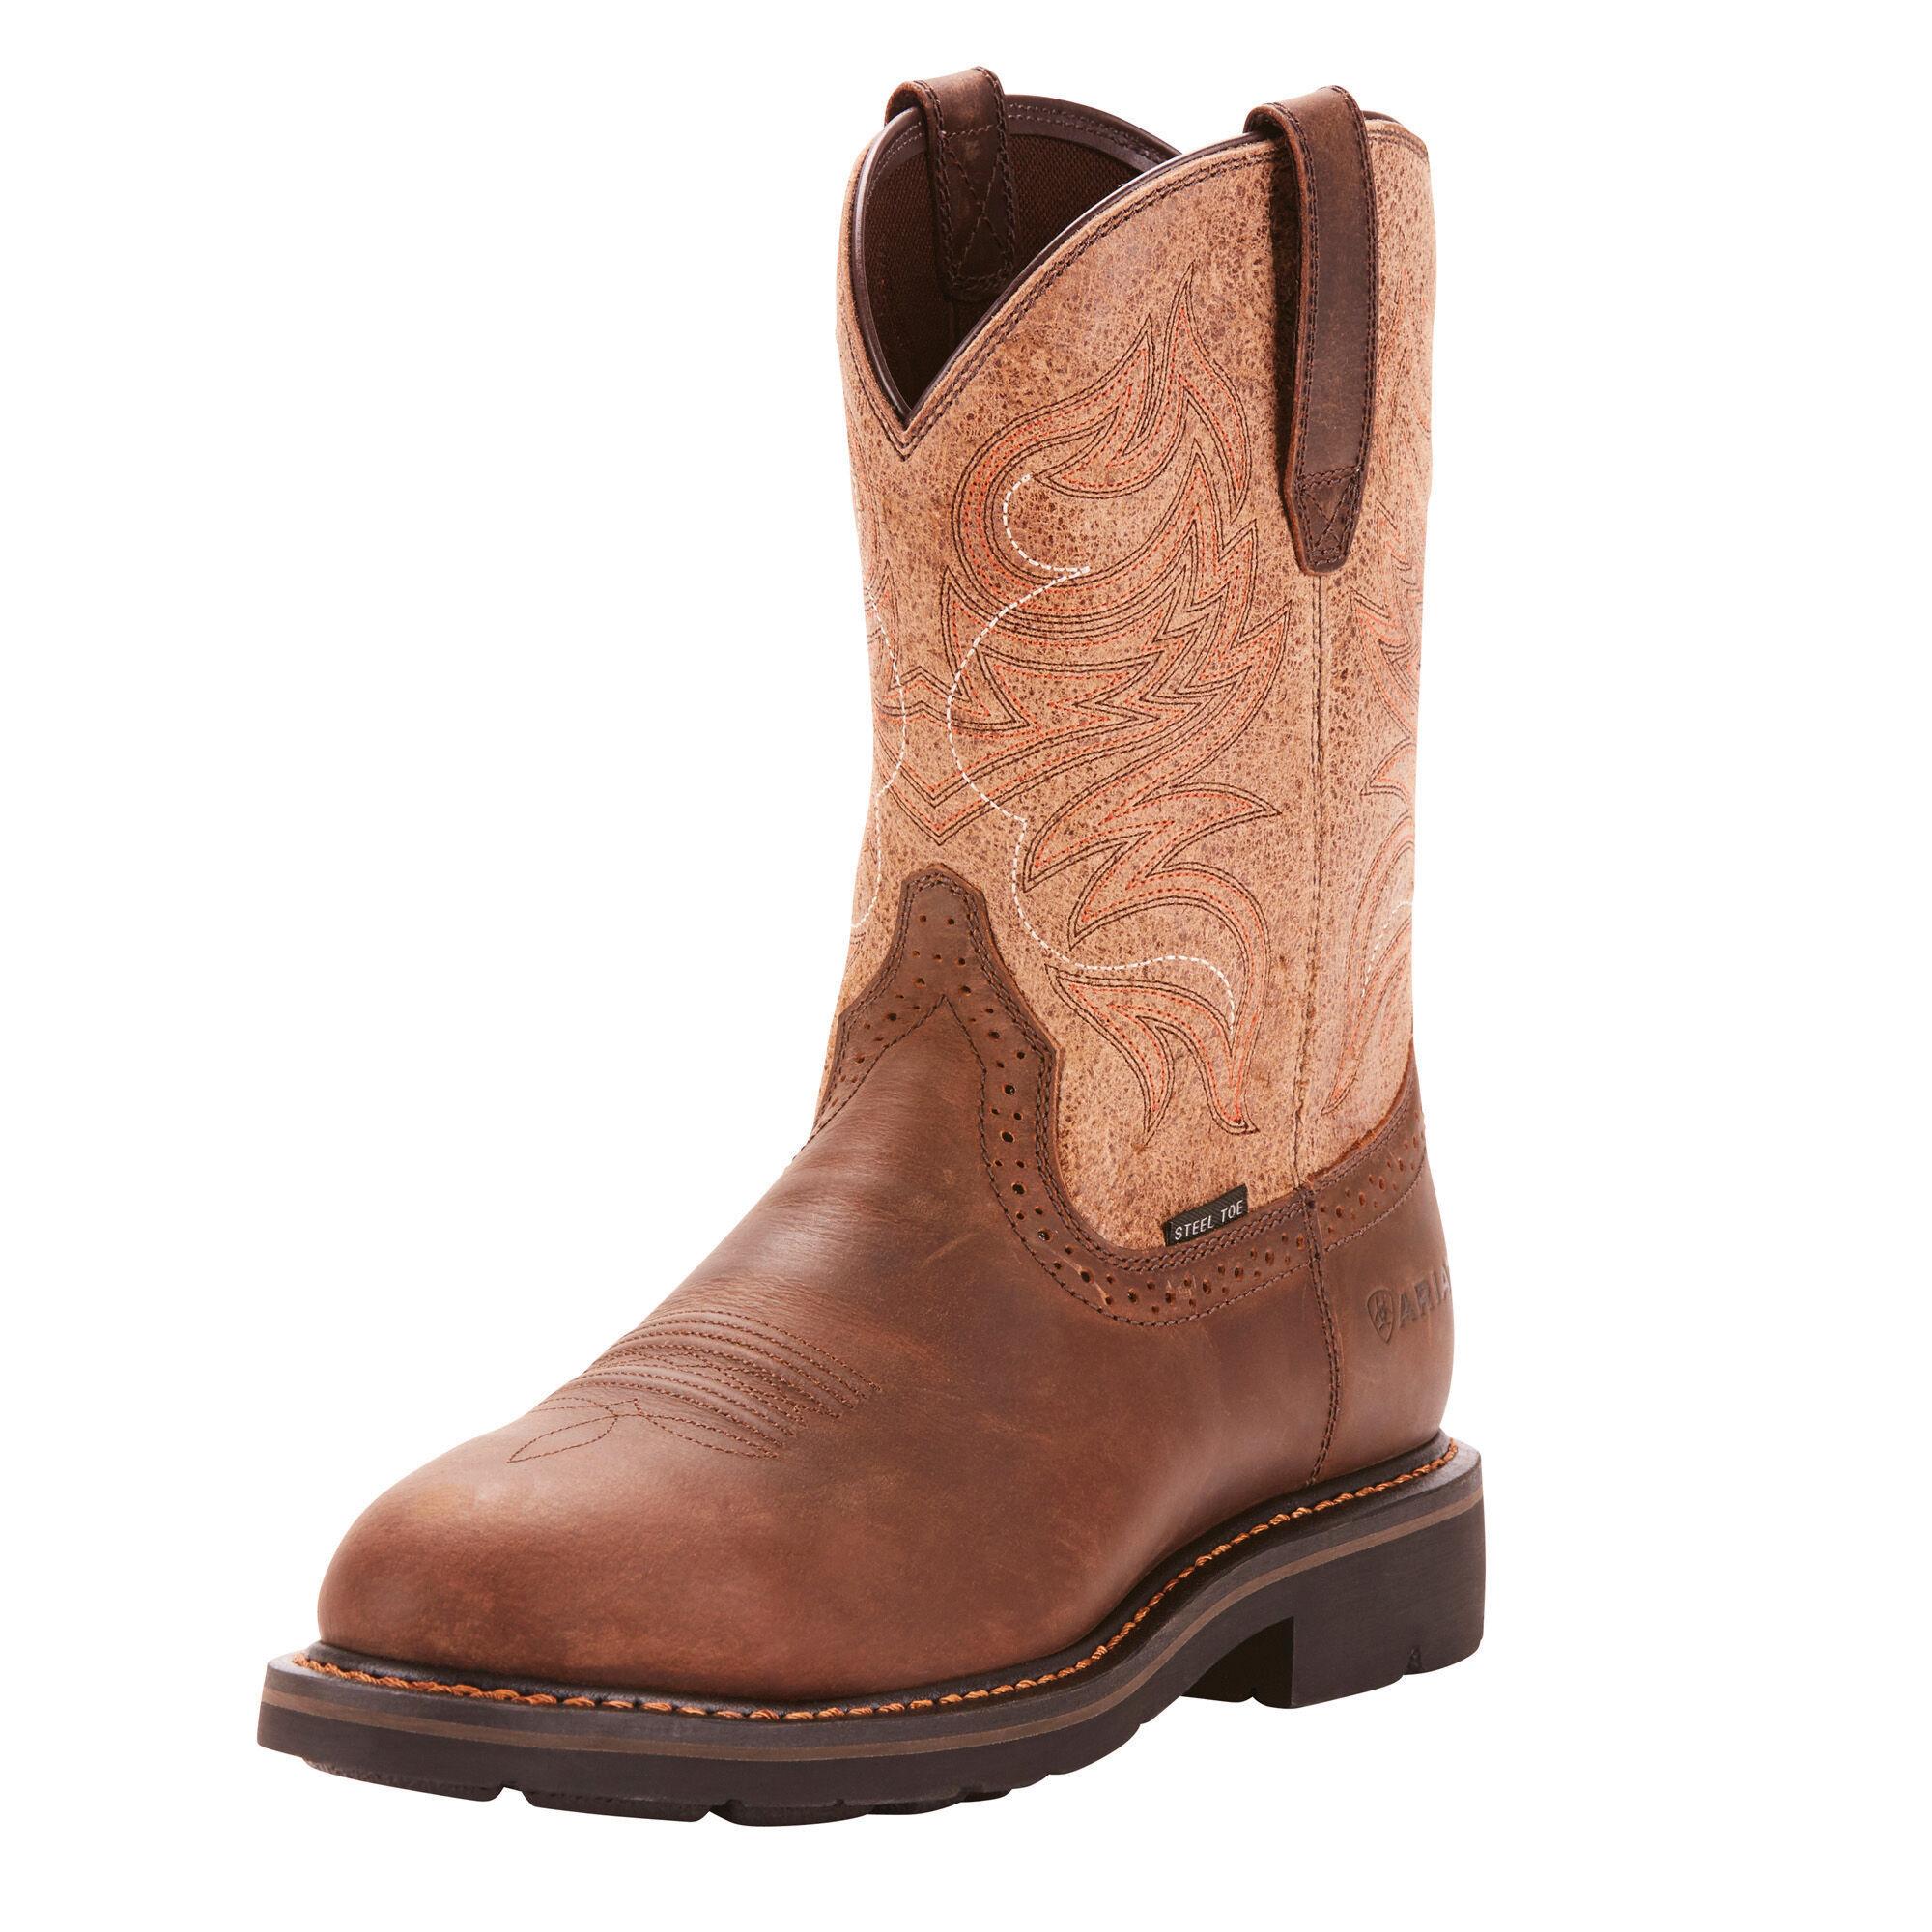 Sierra Shadow Steel Toe Work Boot